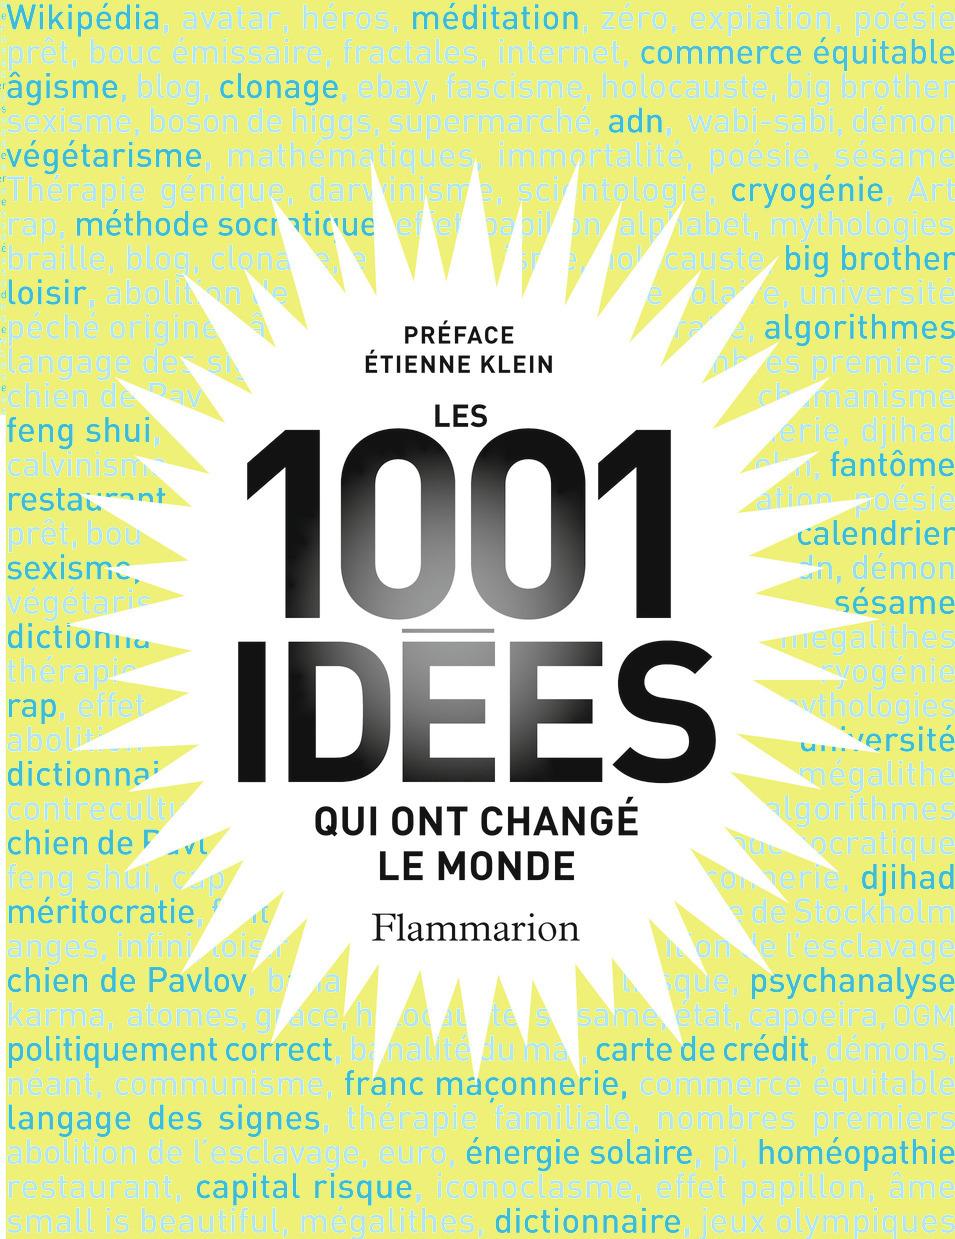 LES 1001 IDEES